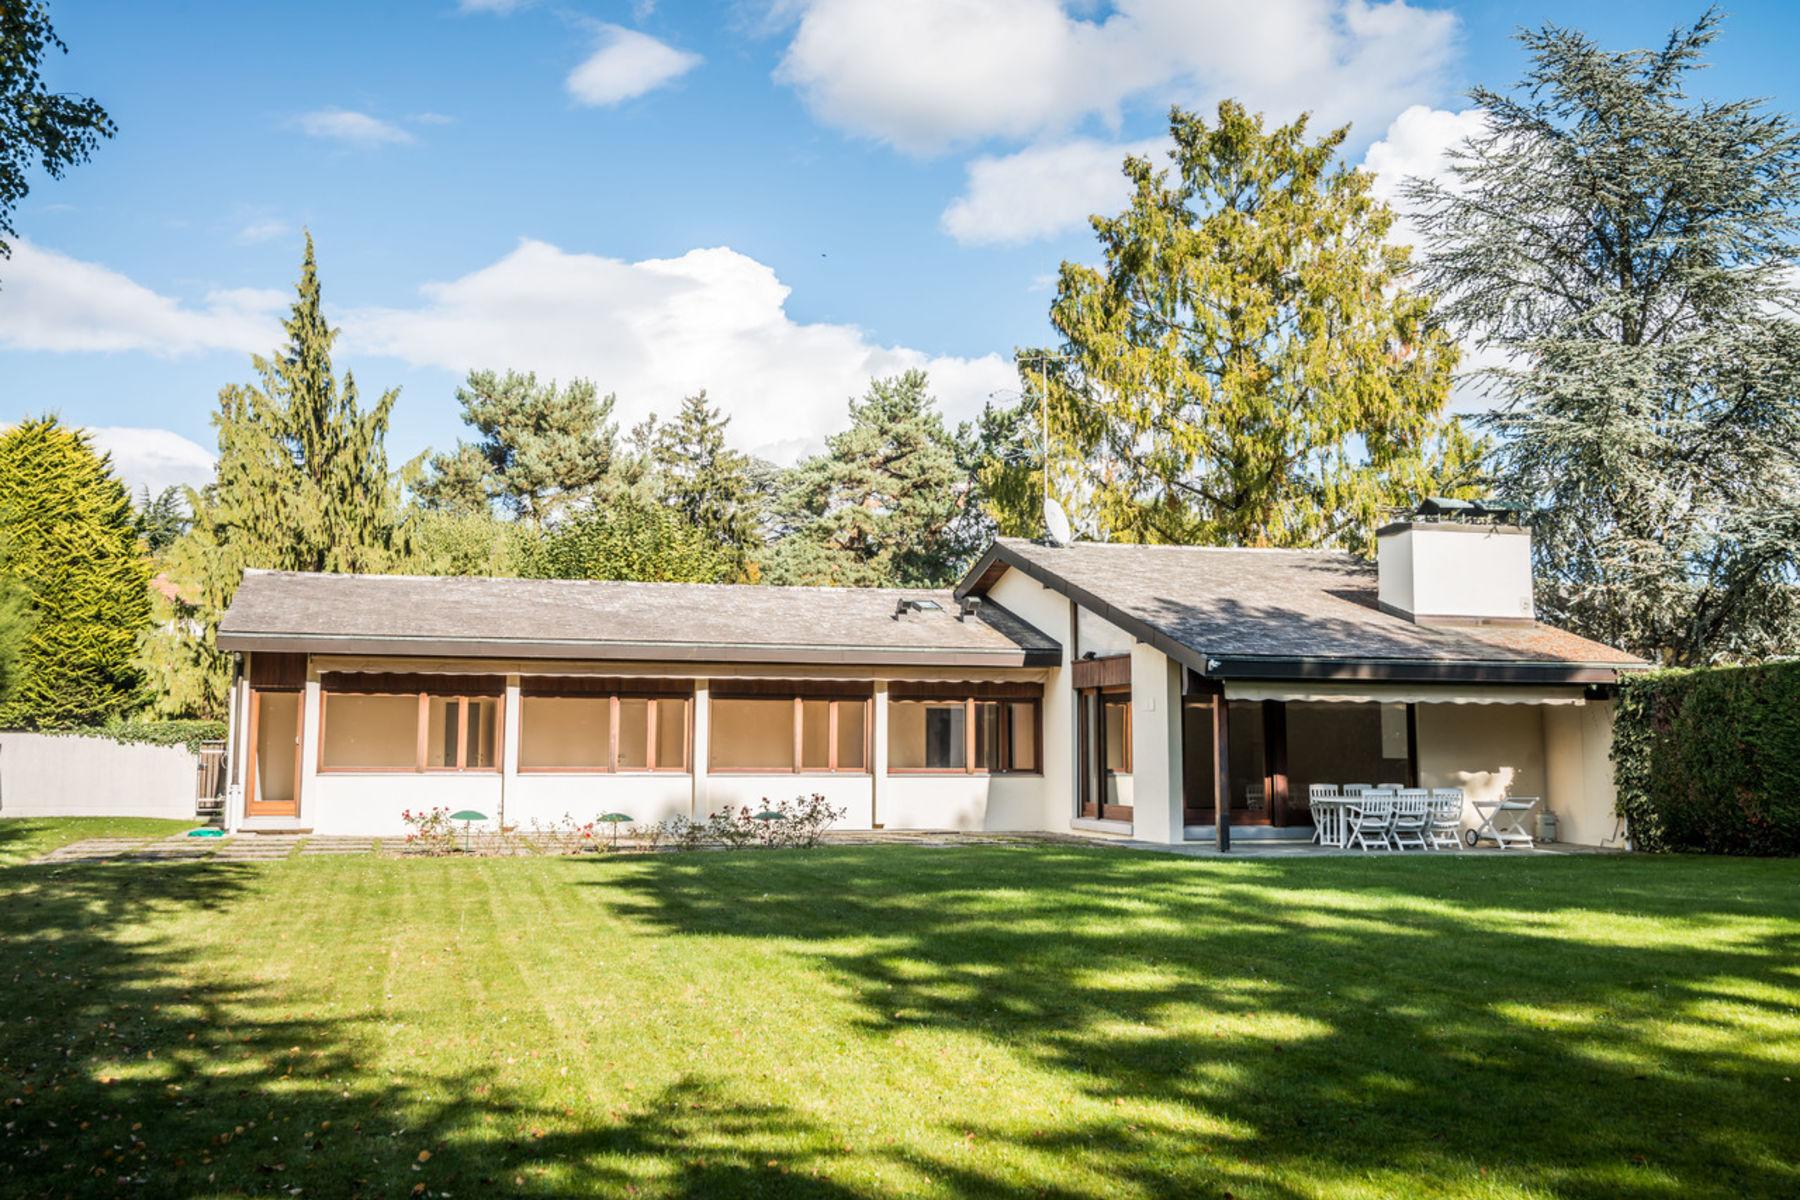 Single Family Home for Sale at For sale, Single family house, 1222 Vésenaz, Réf 7751 Vesenaz, Geneva, 1222 Switzerland